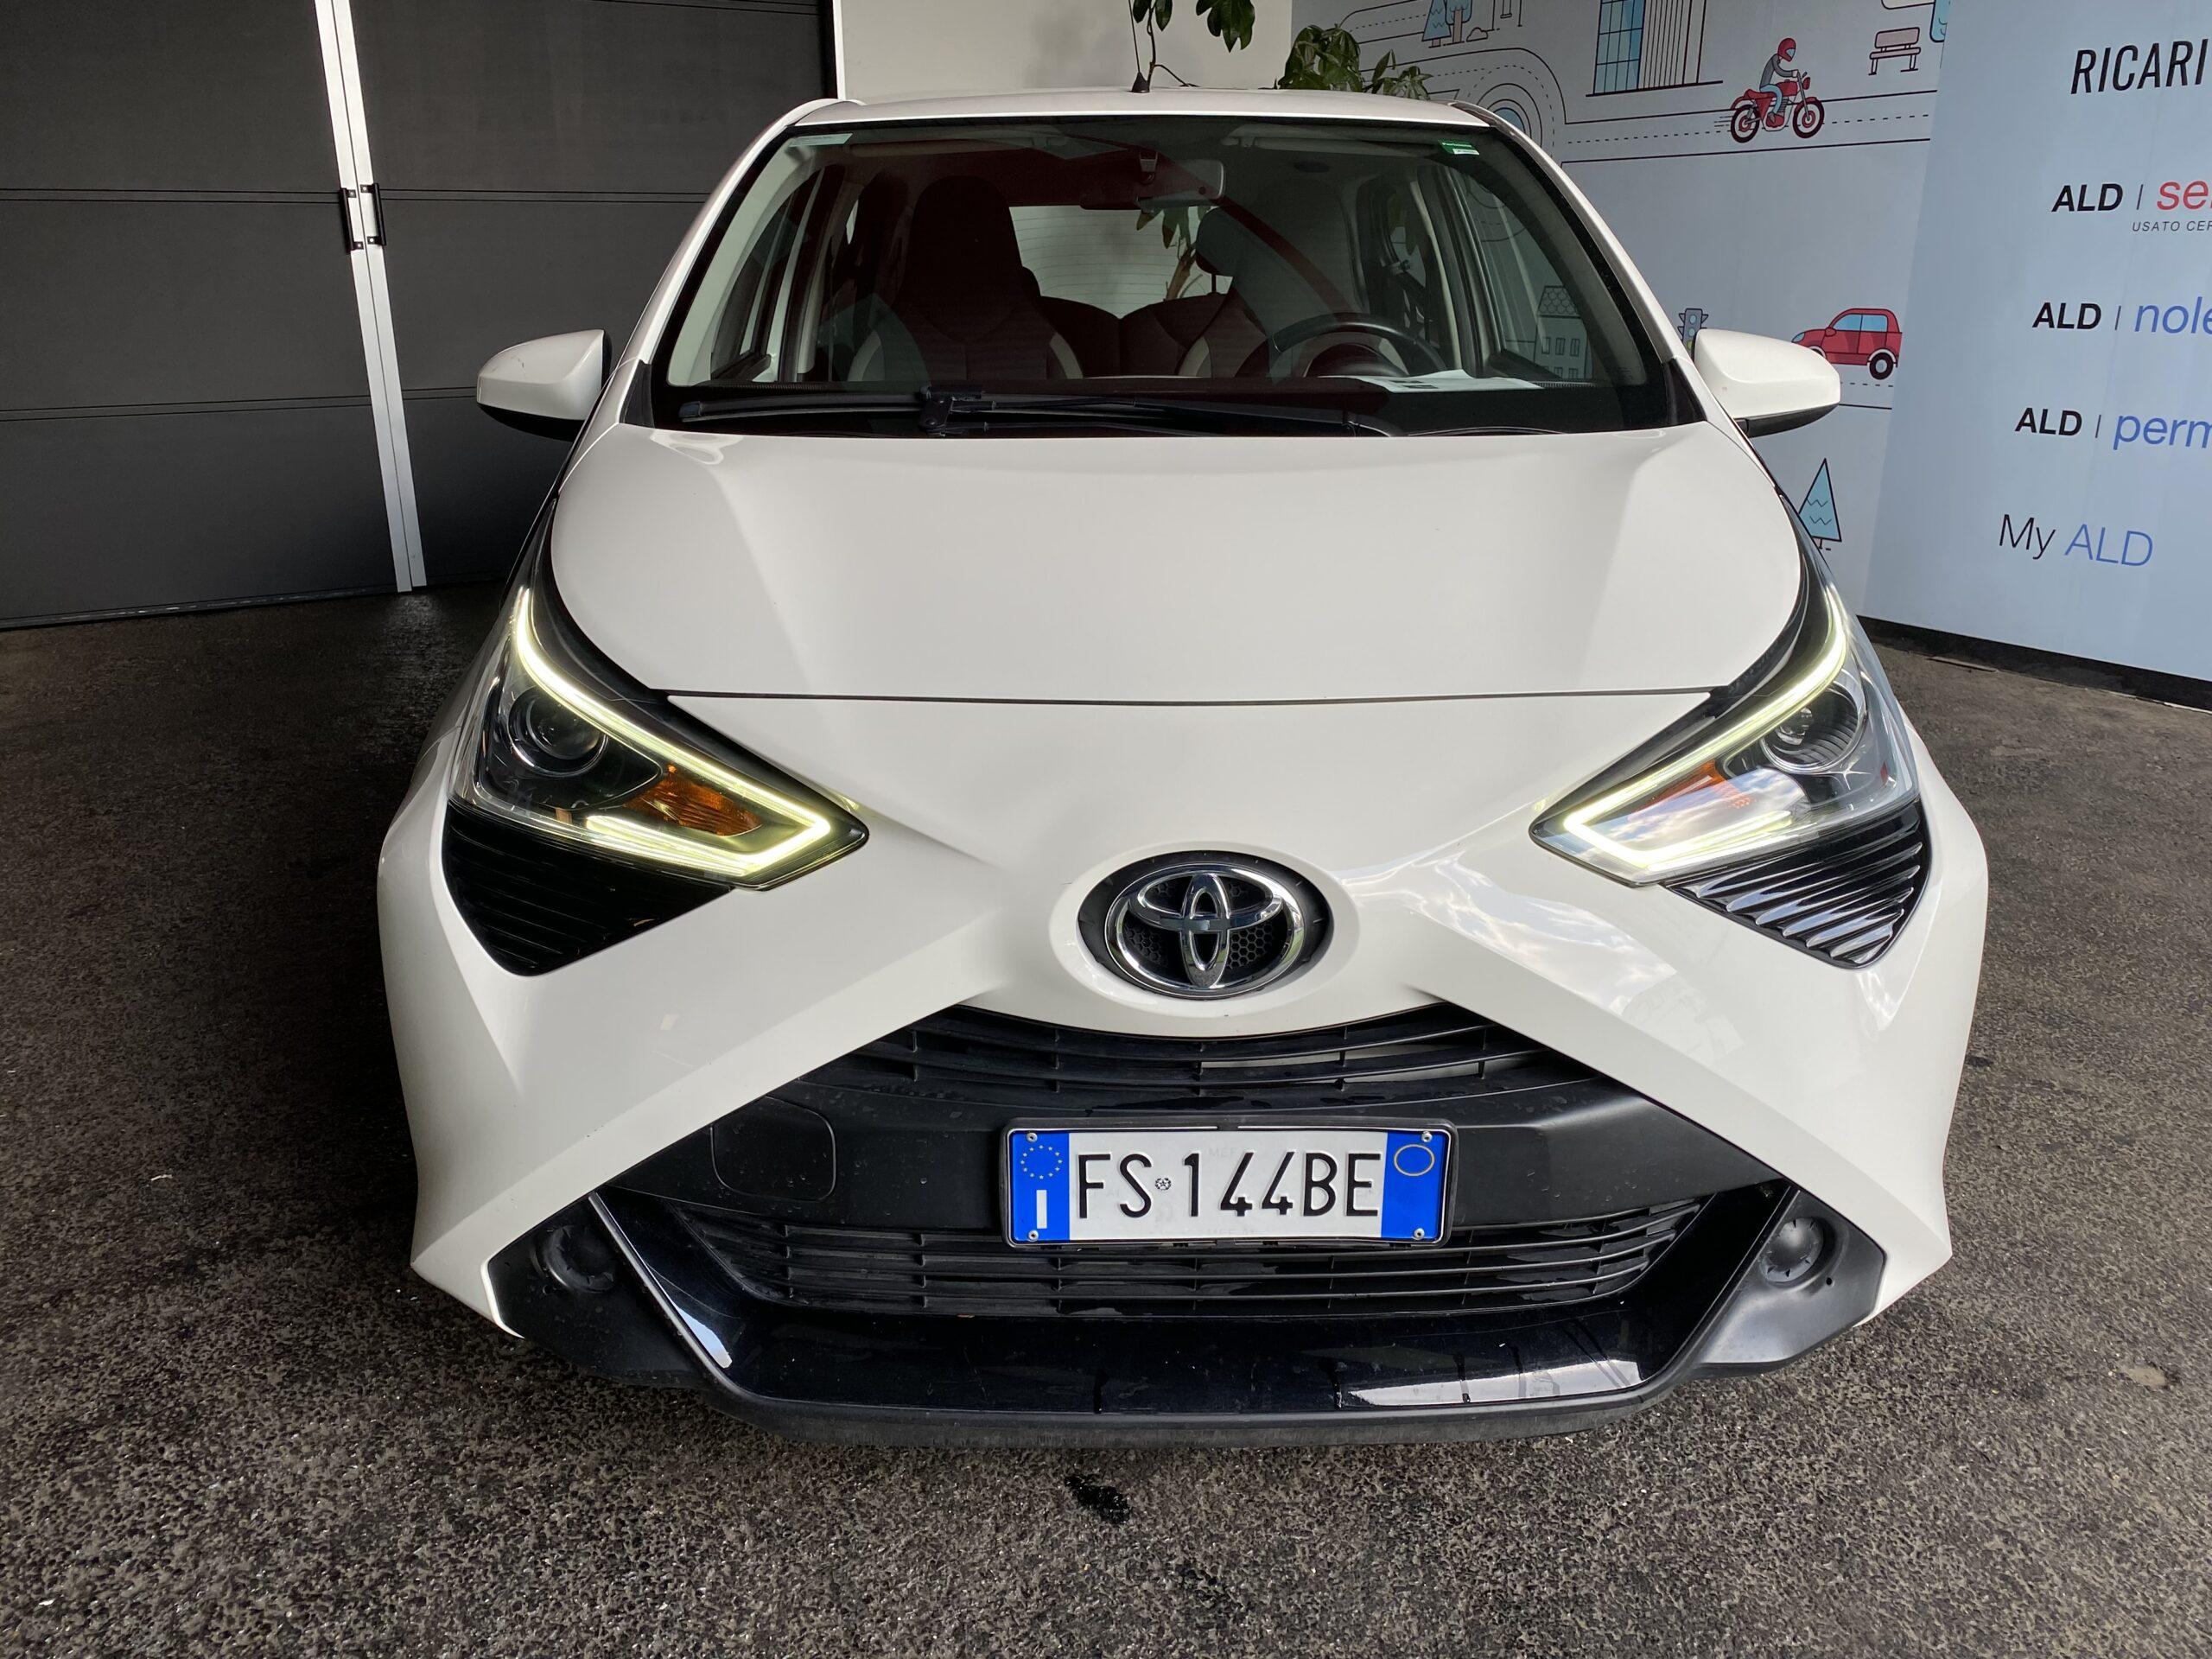 toyota TOYOTA AYGO 1.0 VVT-i x-business Micro car 5-door (Euro 6.2)